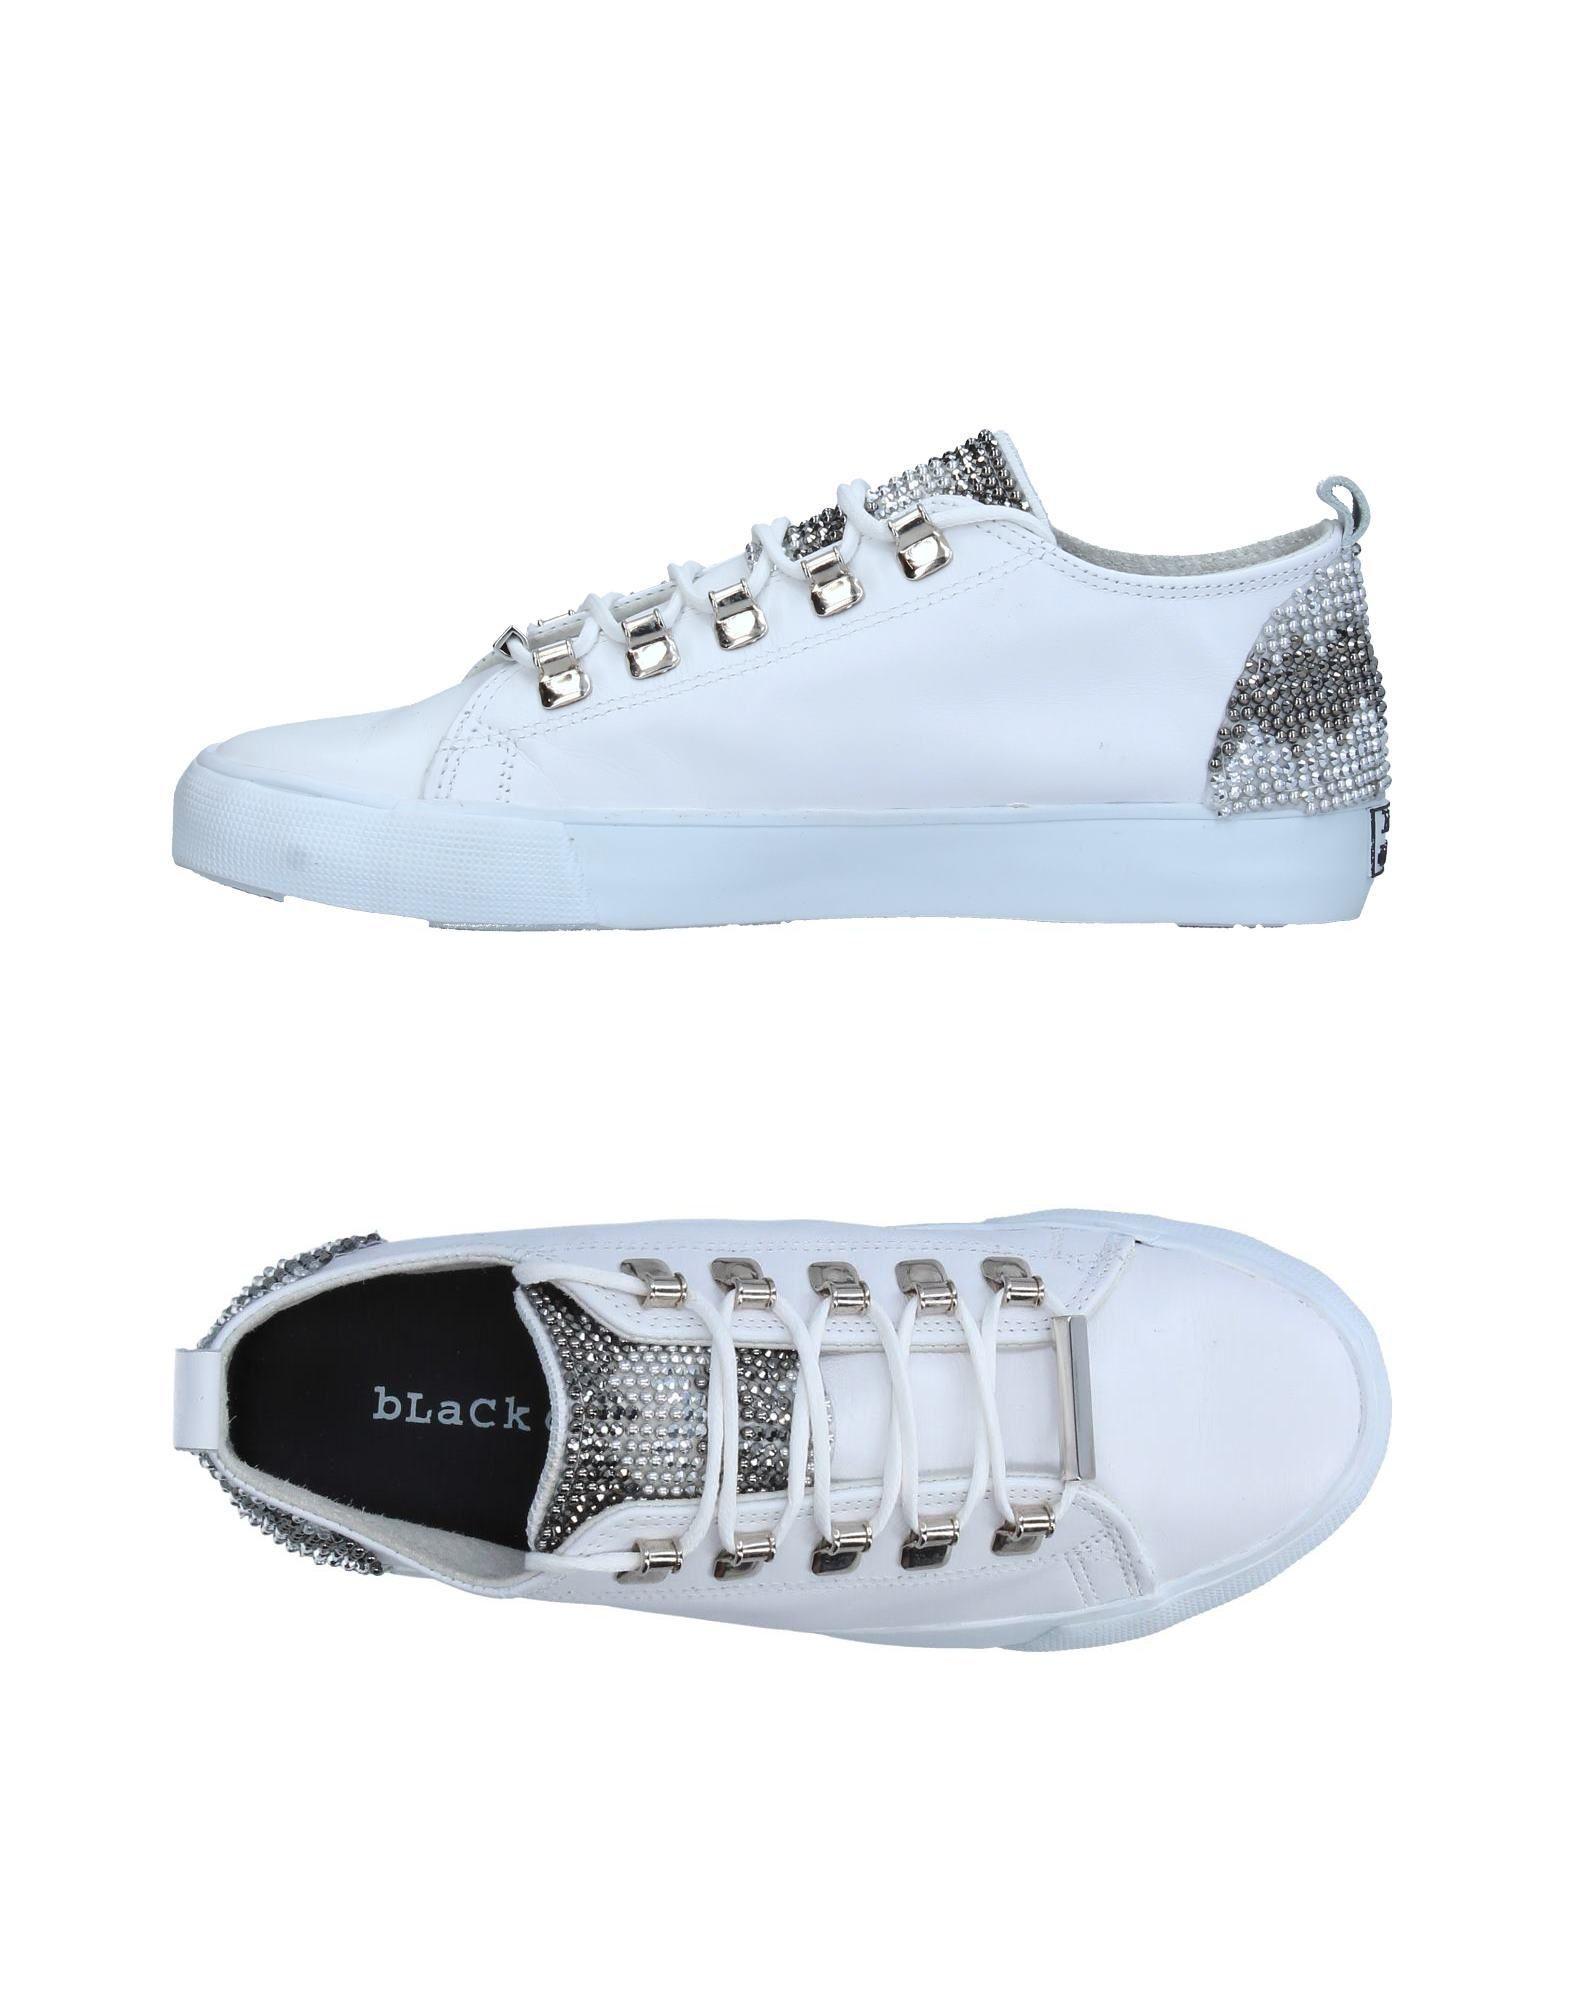 Black Dioniso Sneakers Damen  11359555KJ Qualität Gute Qualität 11359555KJ beliebte Schuhe 1085f8